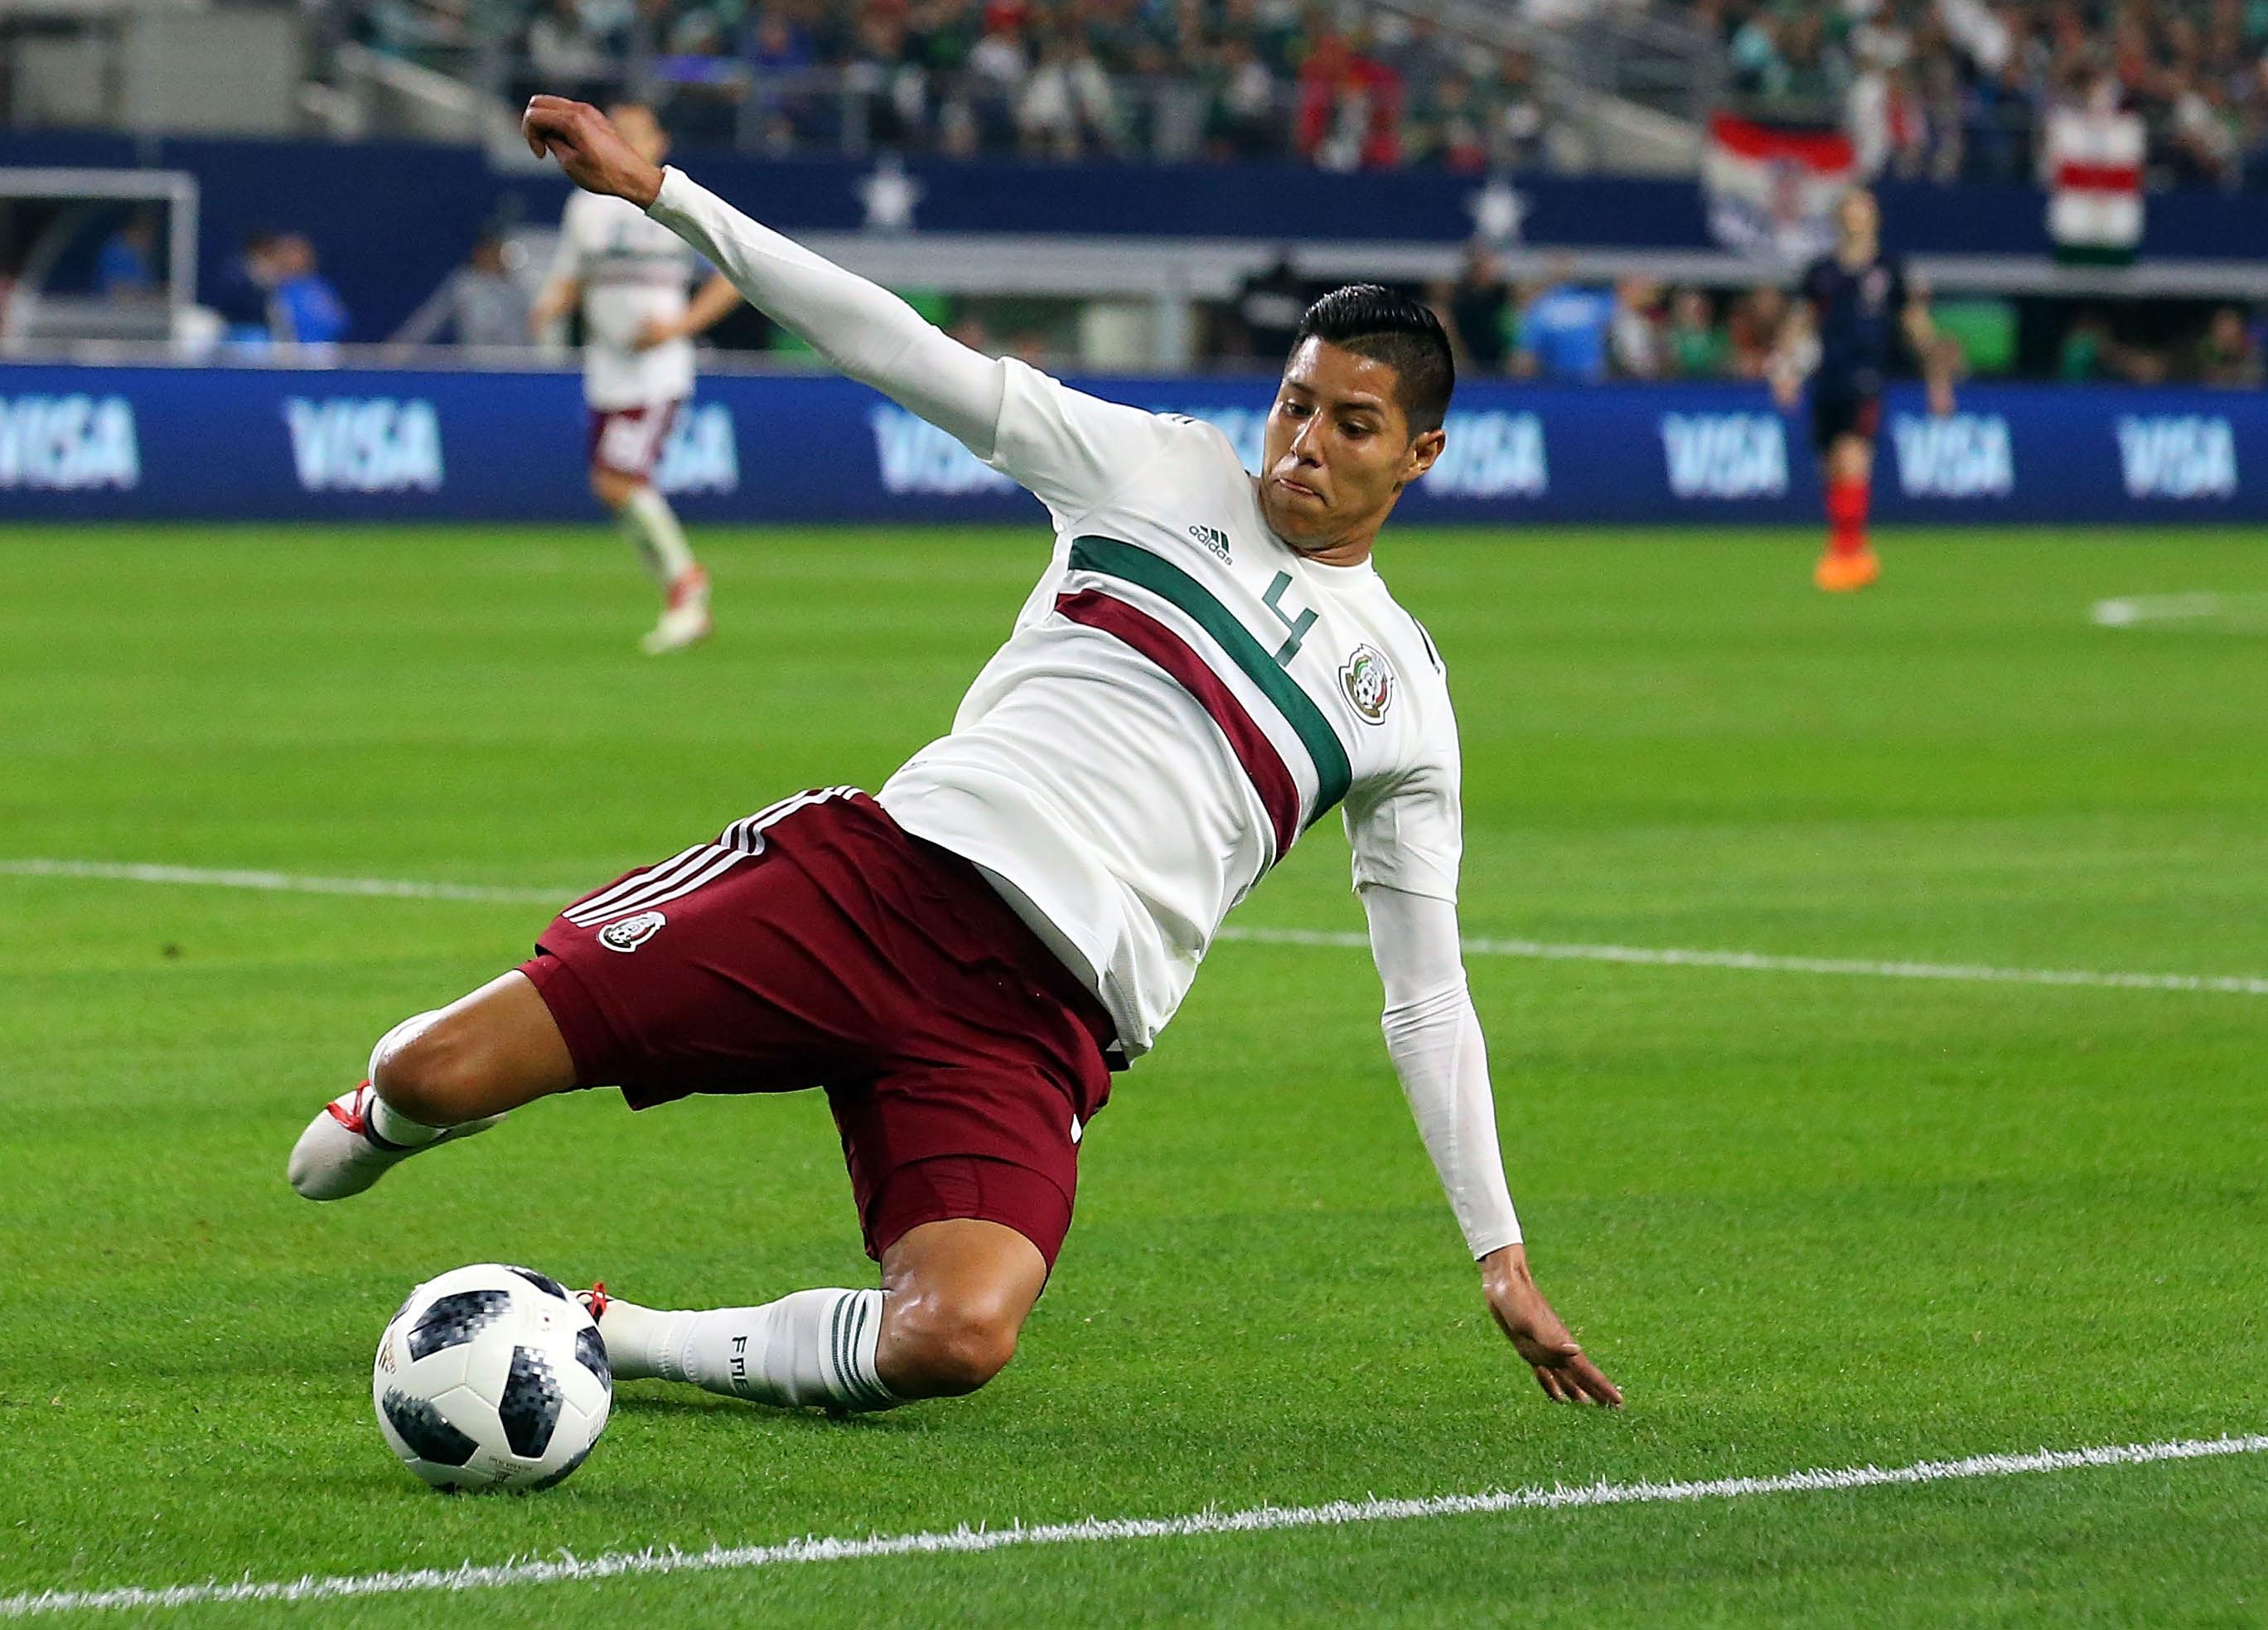 Hugo Ayala Posible Refuerzo Chivas Guadalajara